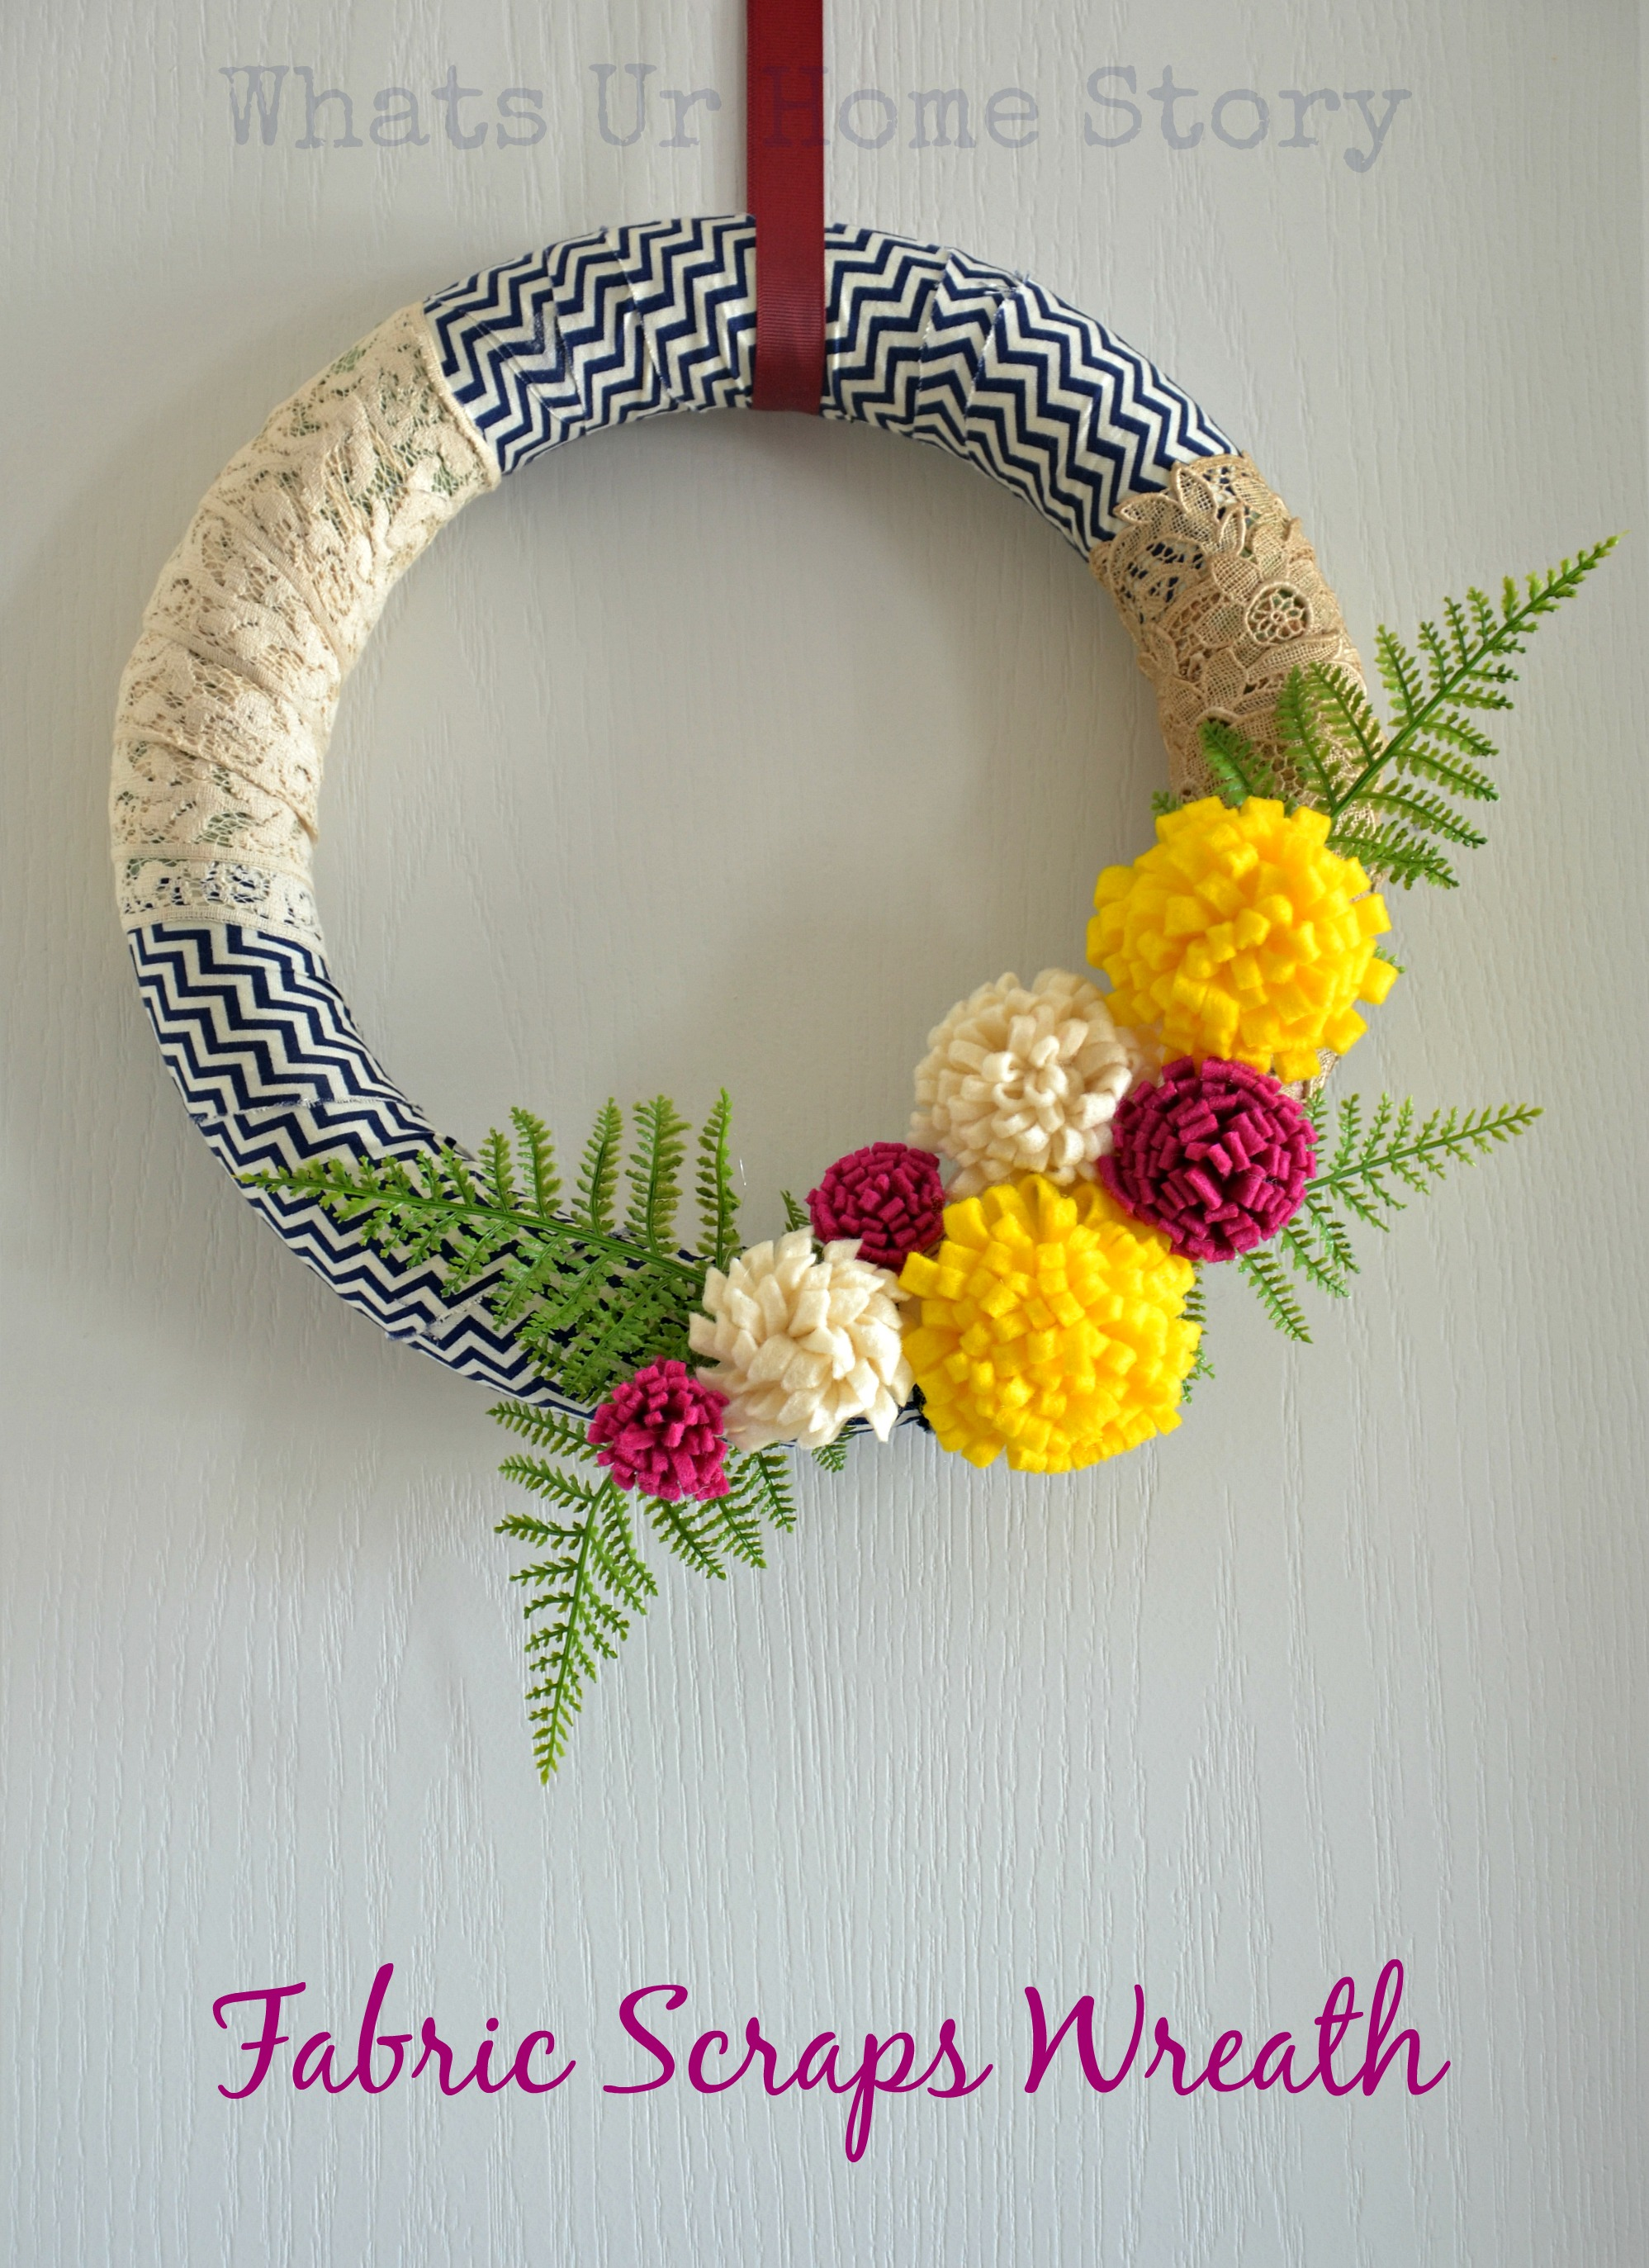 fabric scraps wreath, felt flower wreath, spring wreath